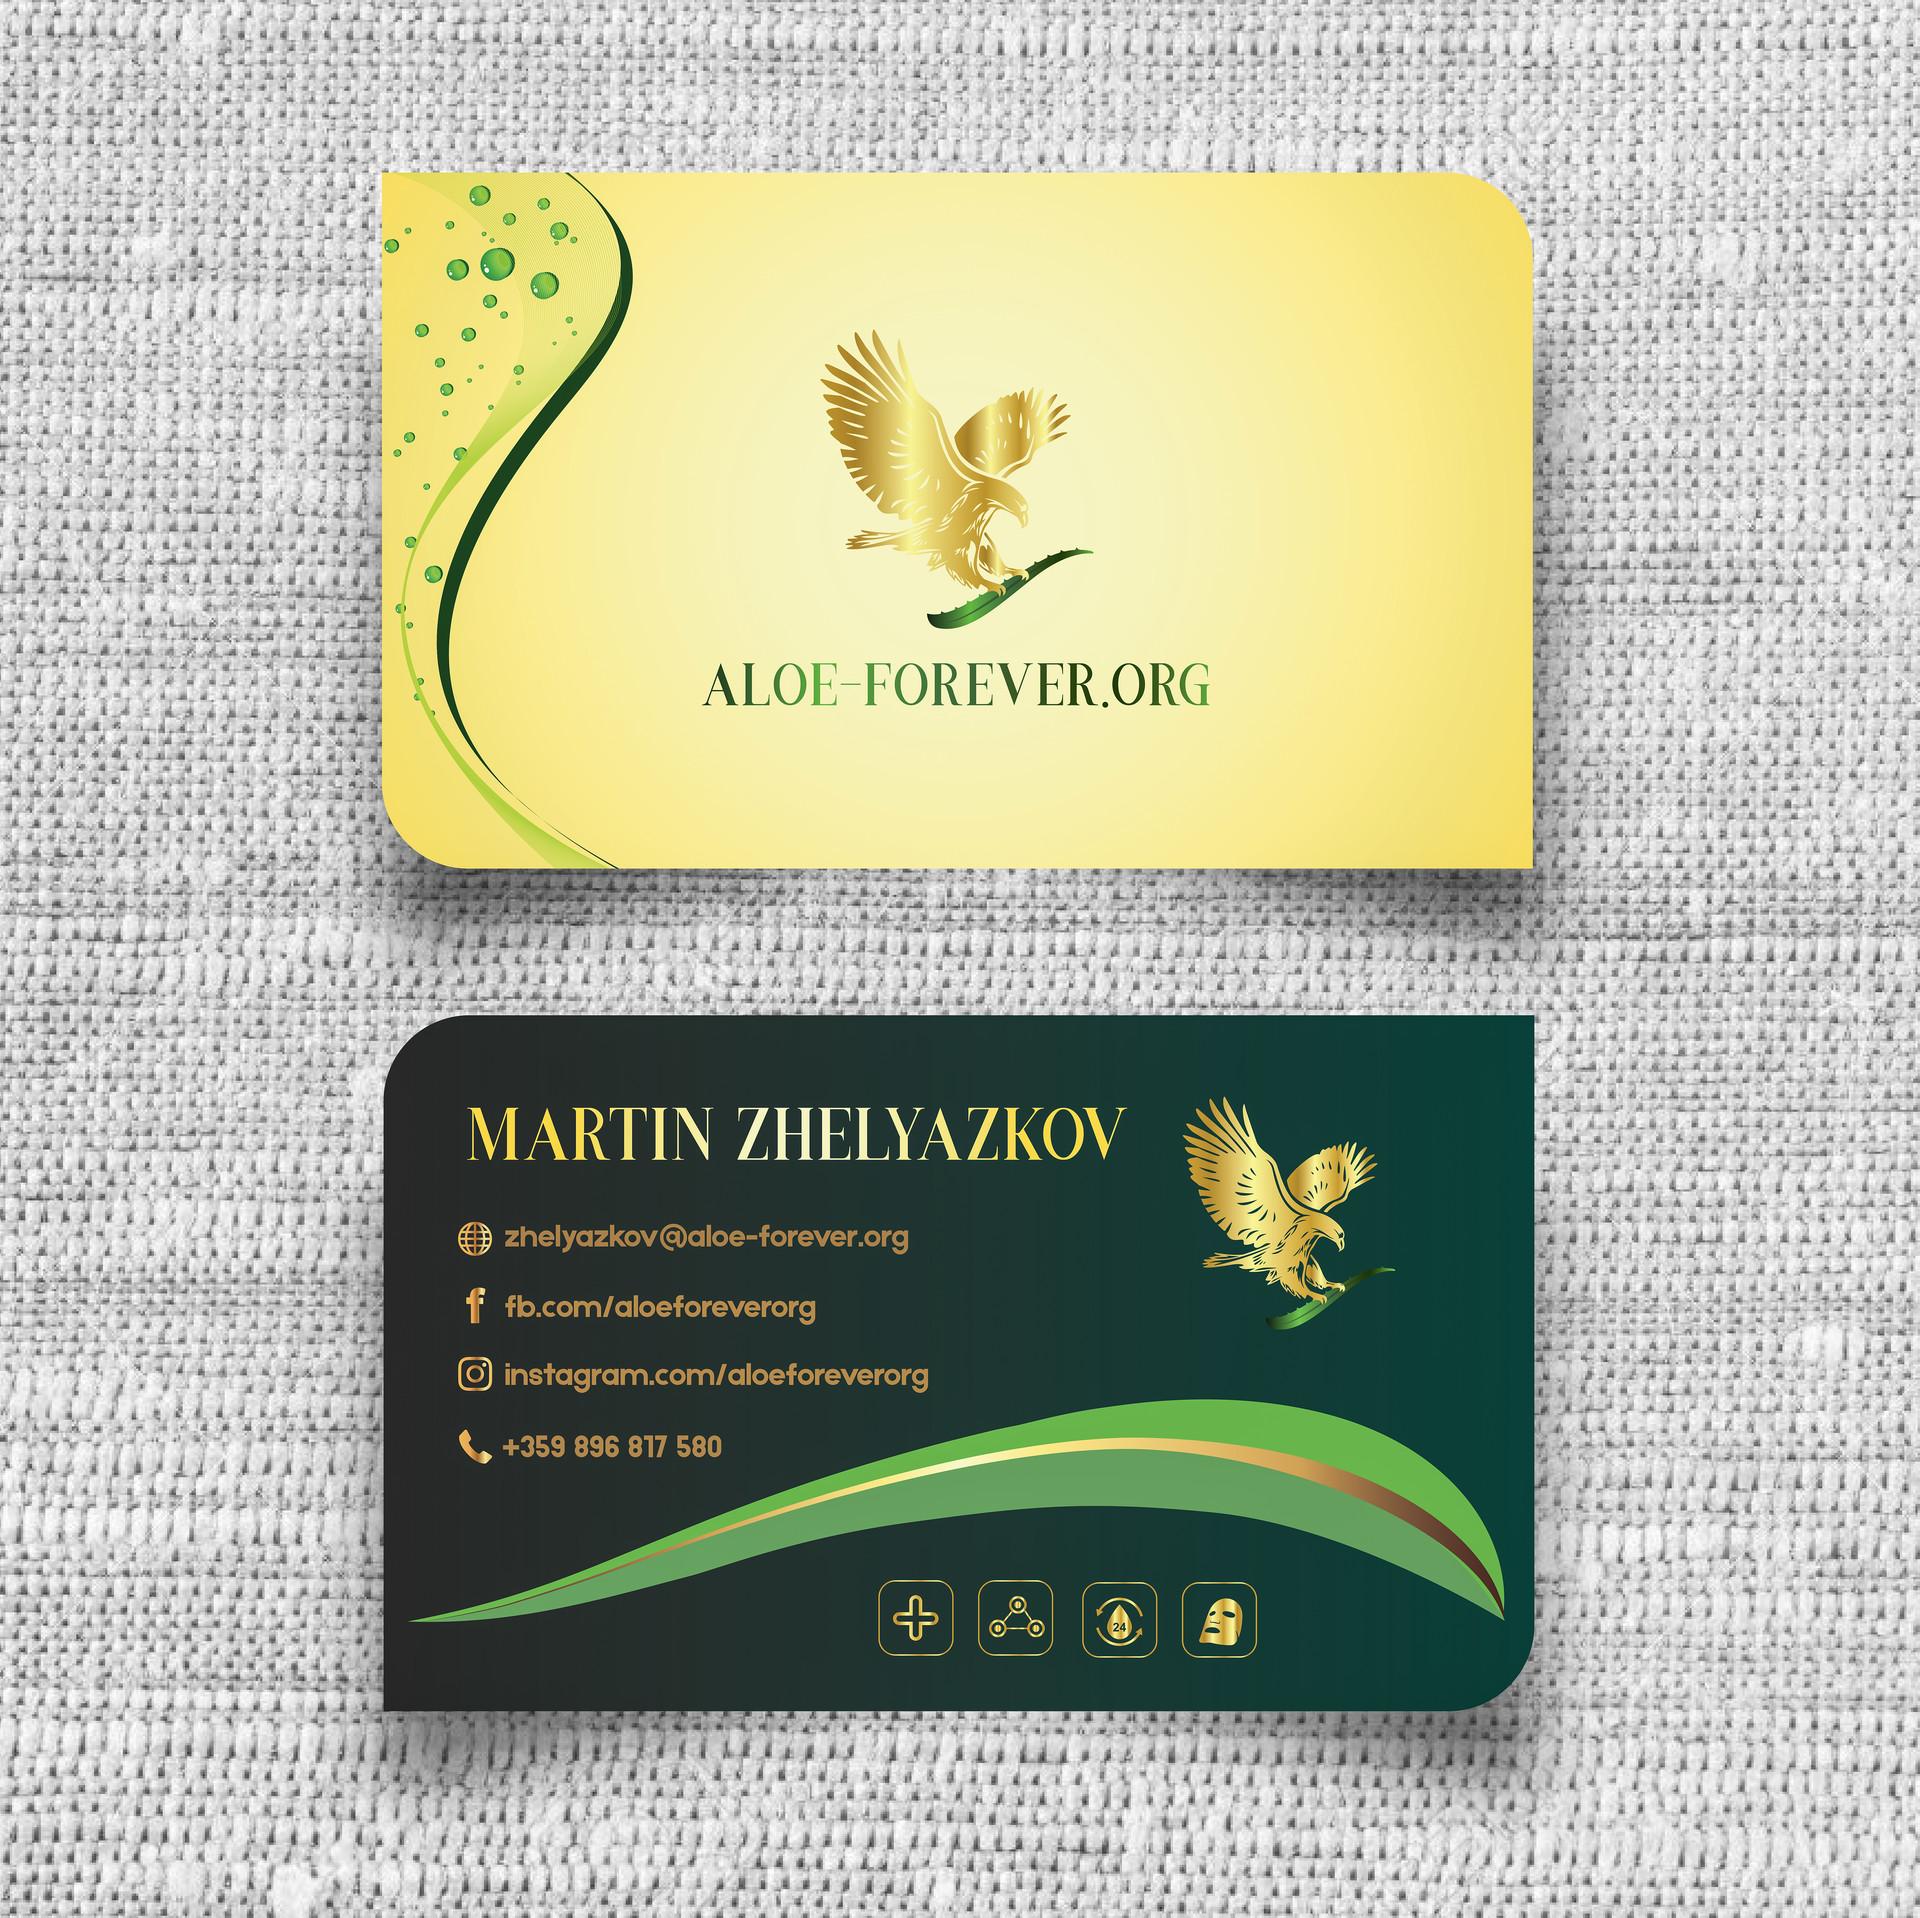 ArtStation - Business Card Designs (incl. LOGOS), PARADOX BEATBOX